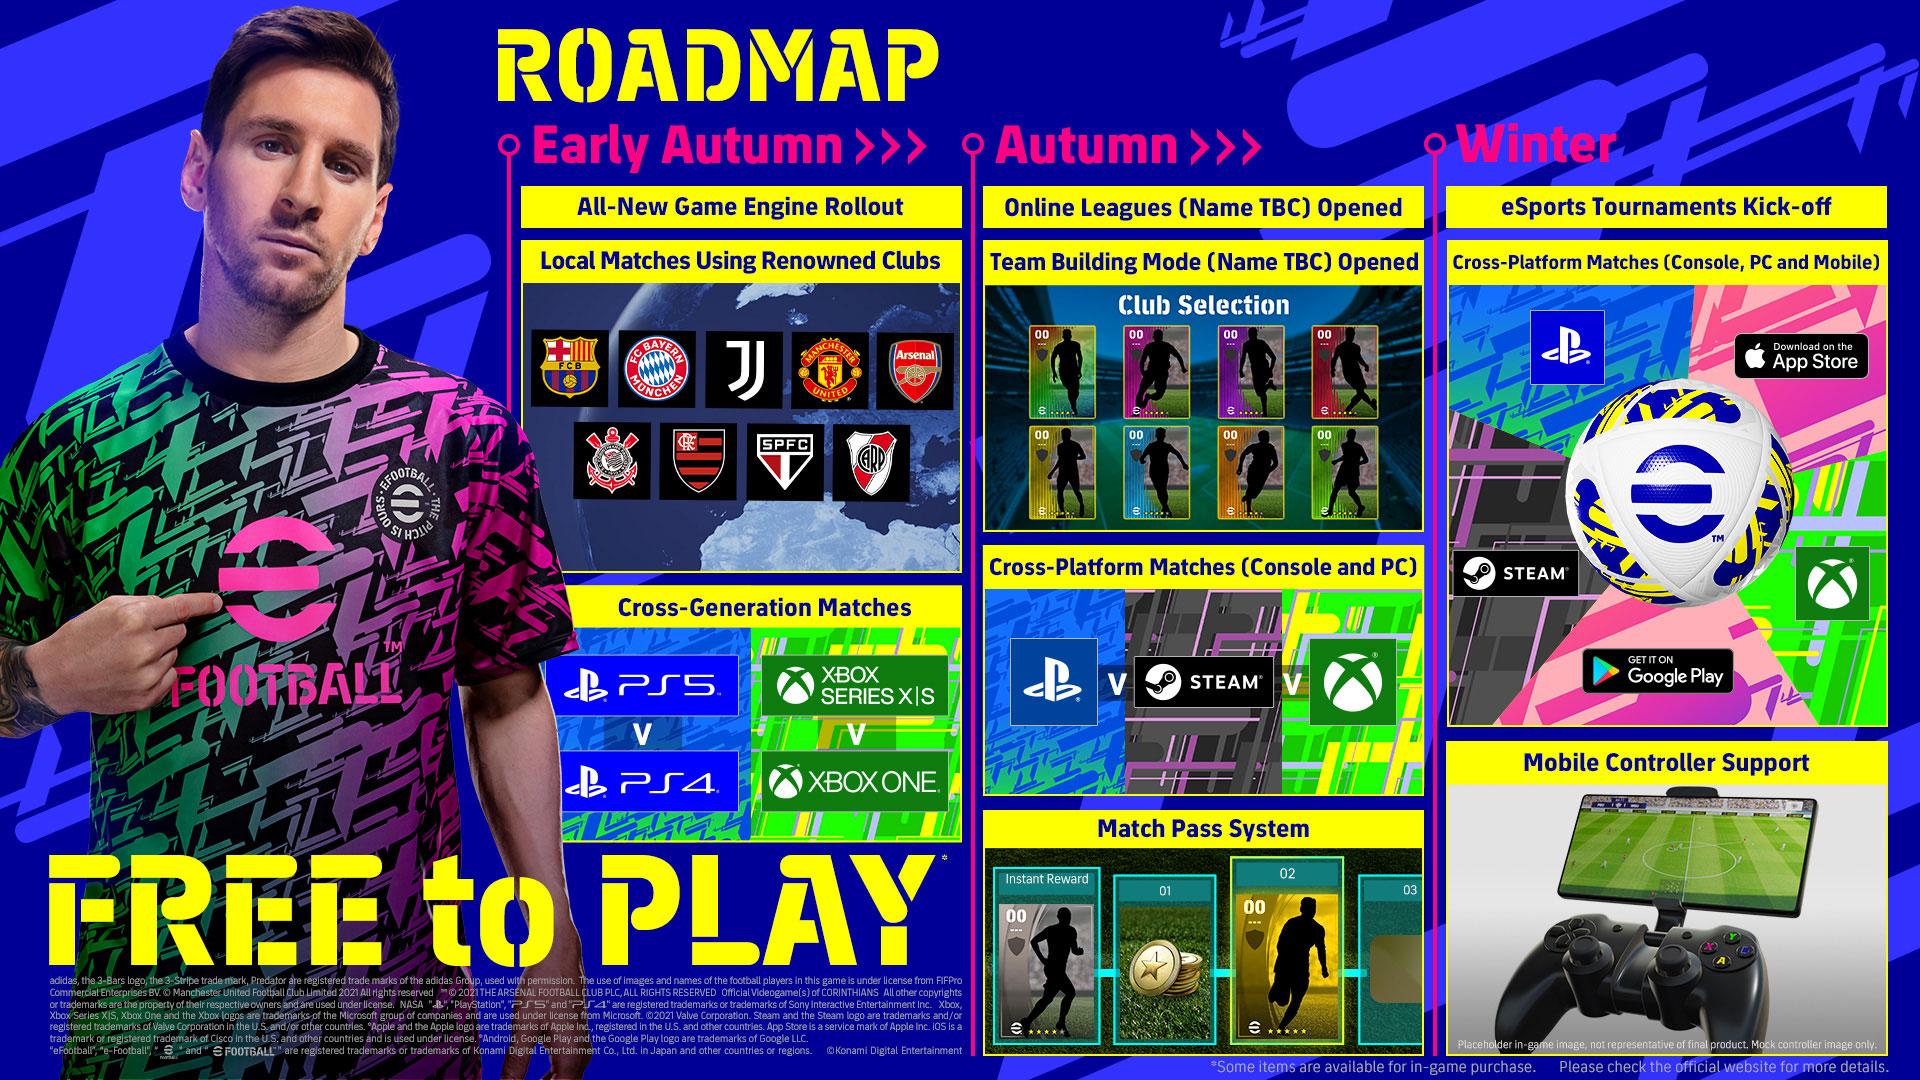 3DM速报:惩戒魅魔Steam锁国区 育碧《碧海黑帆》预算超1.2亿刀